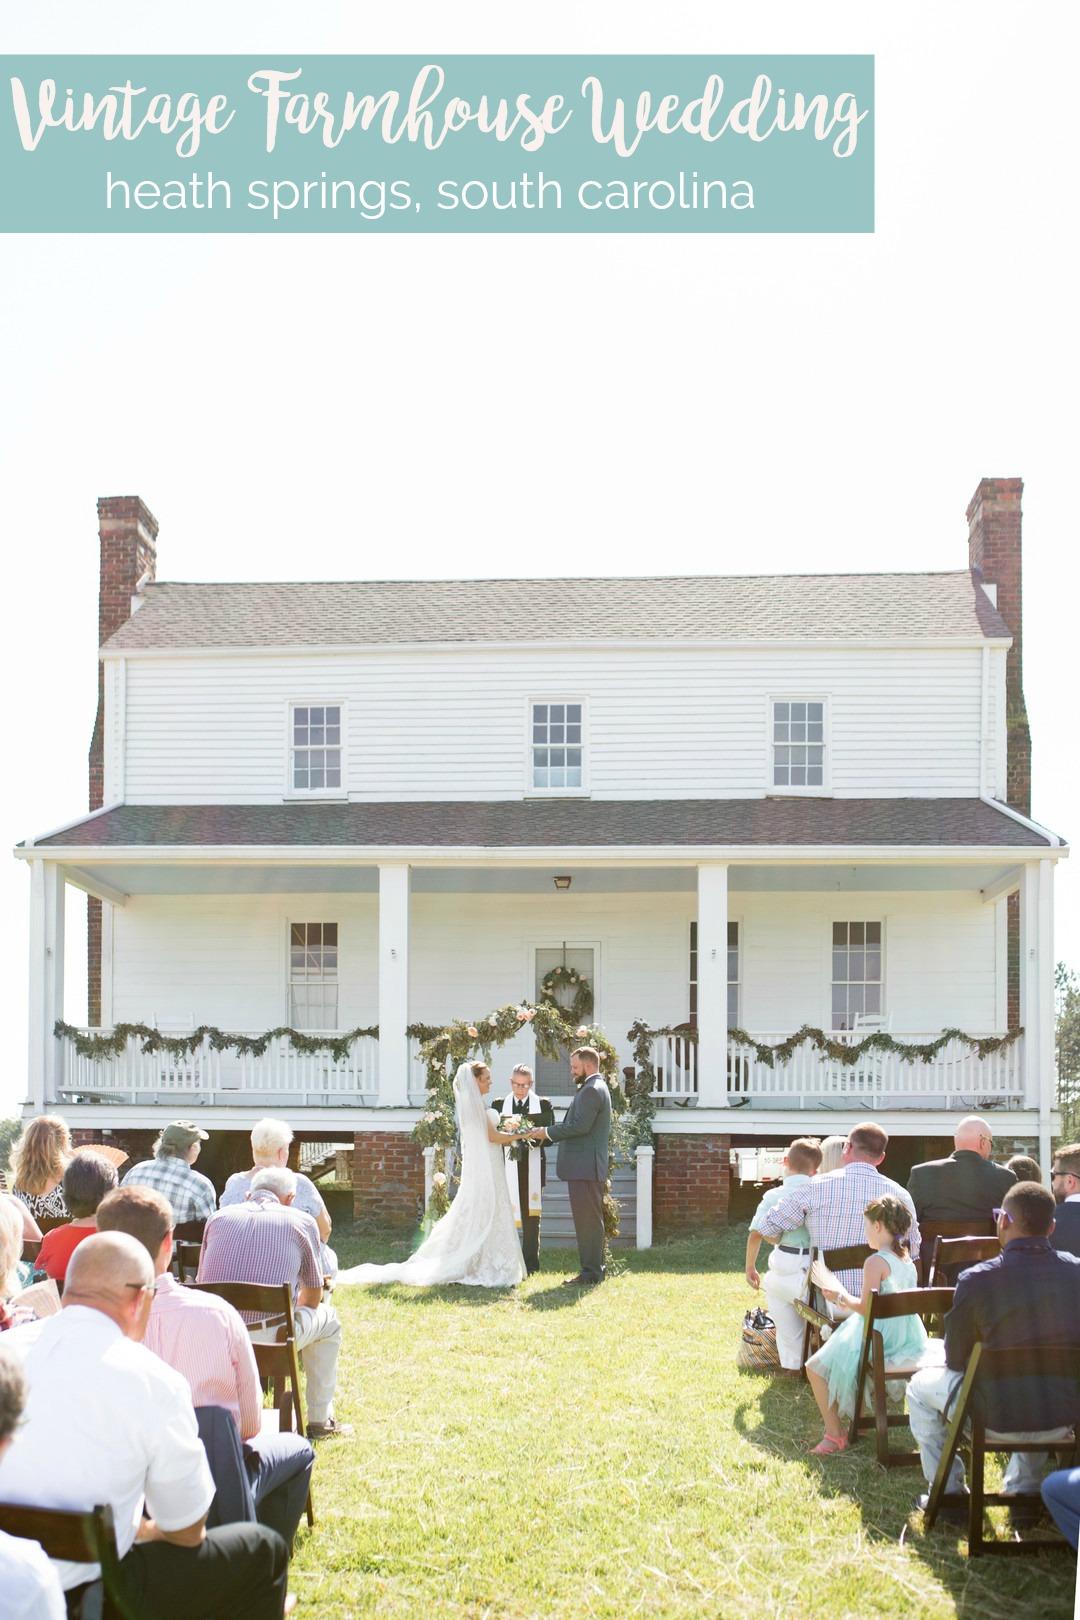 Kat + Nathan: Idyllic Farmhouse Wedding with Family History | Palmetto State Weddings | Jessica Hunt Photography | Vintage inspired wedding